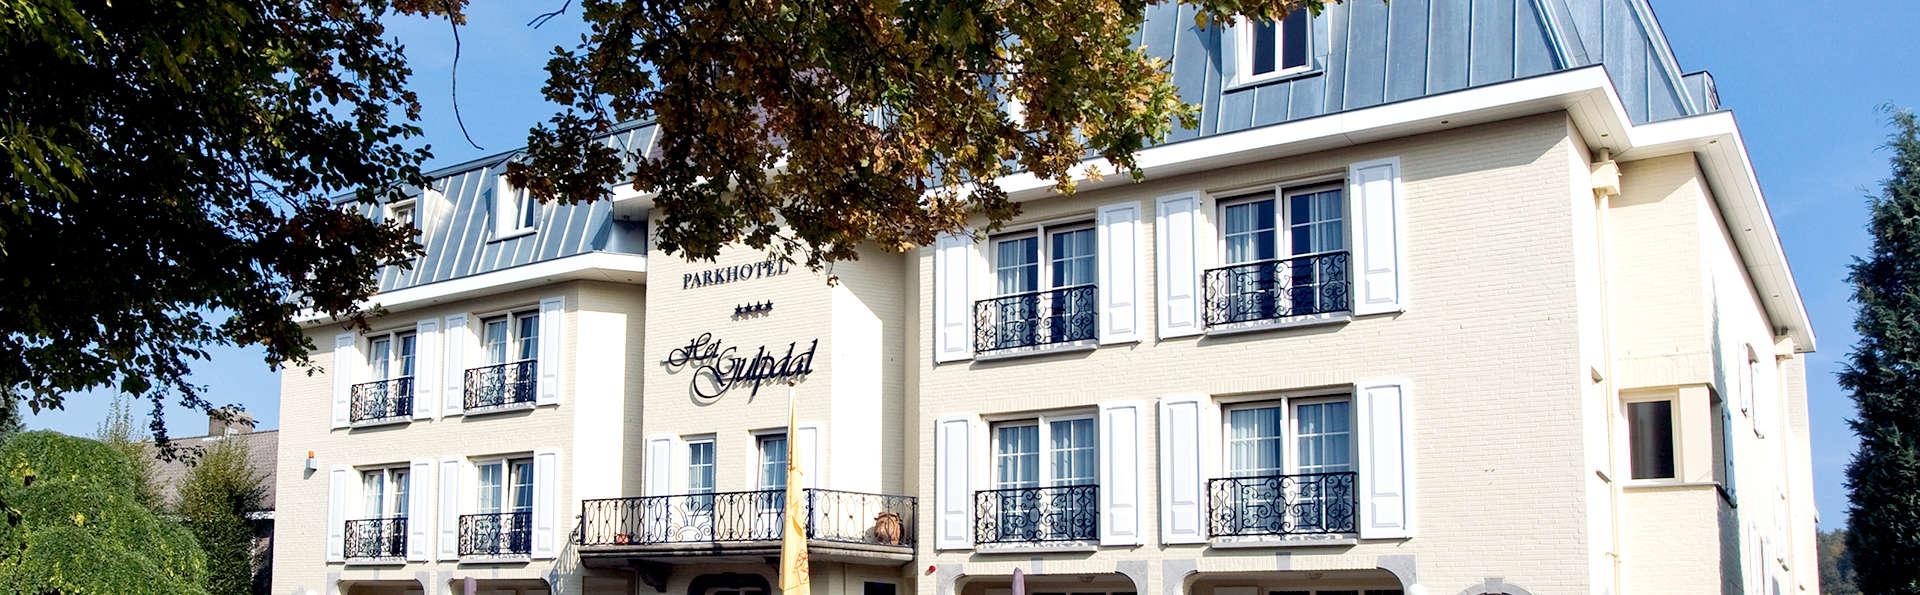 Romantik Parkhotel het Gulpdal Slenaken - Edit_Front.jpg